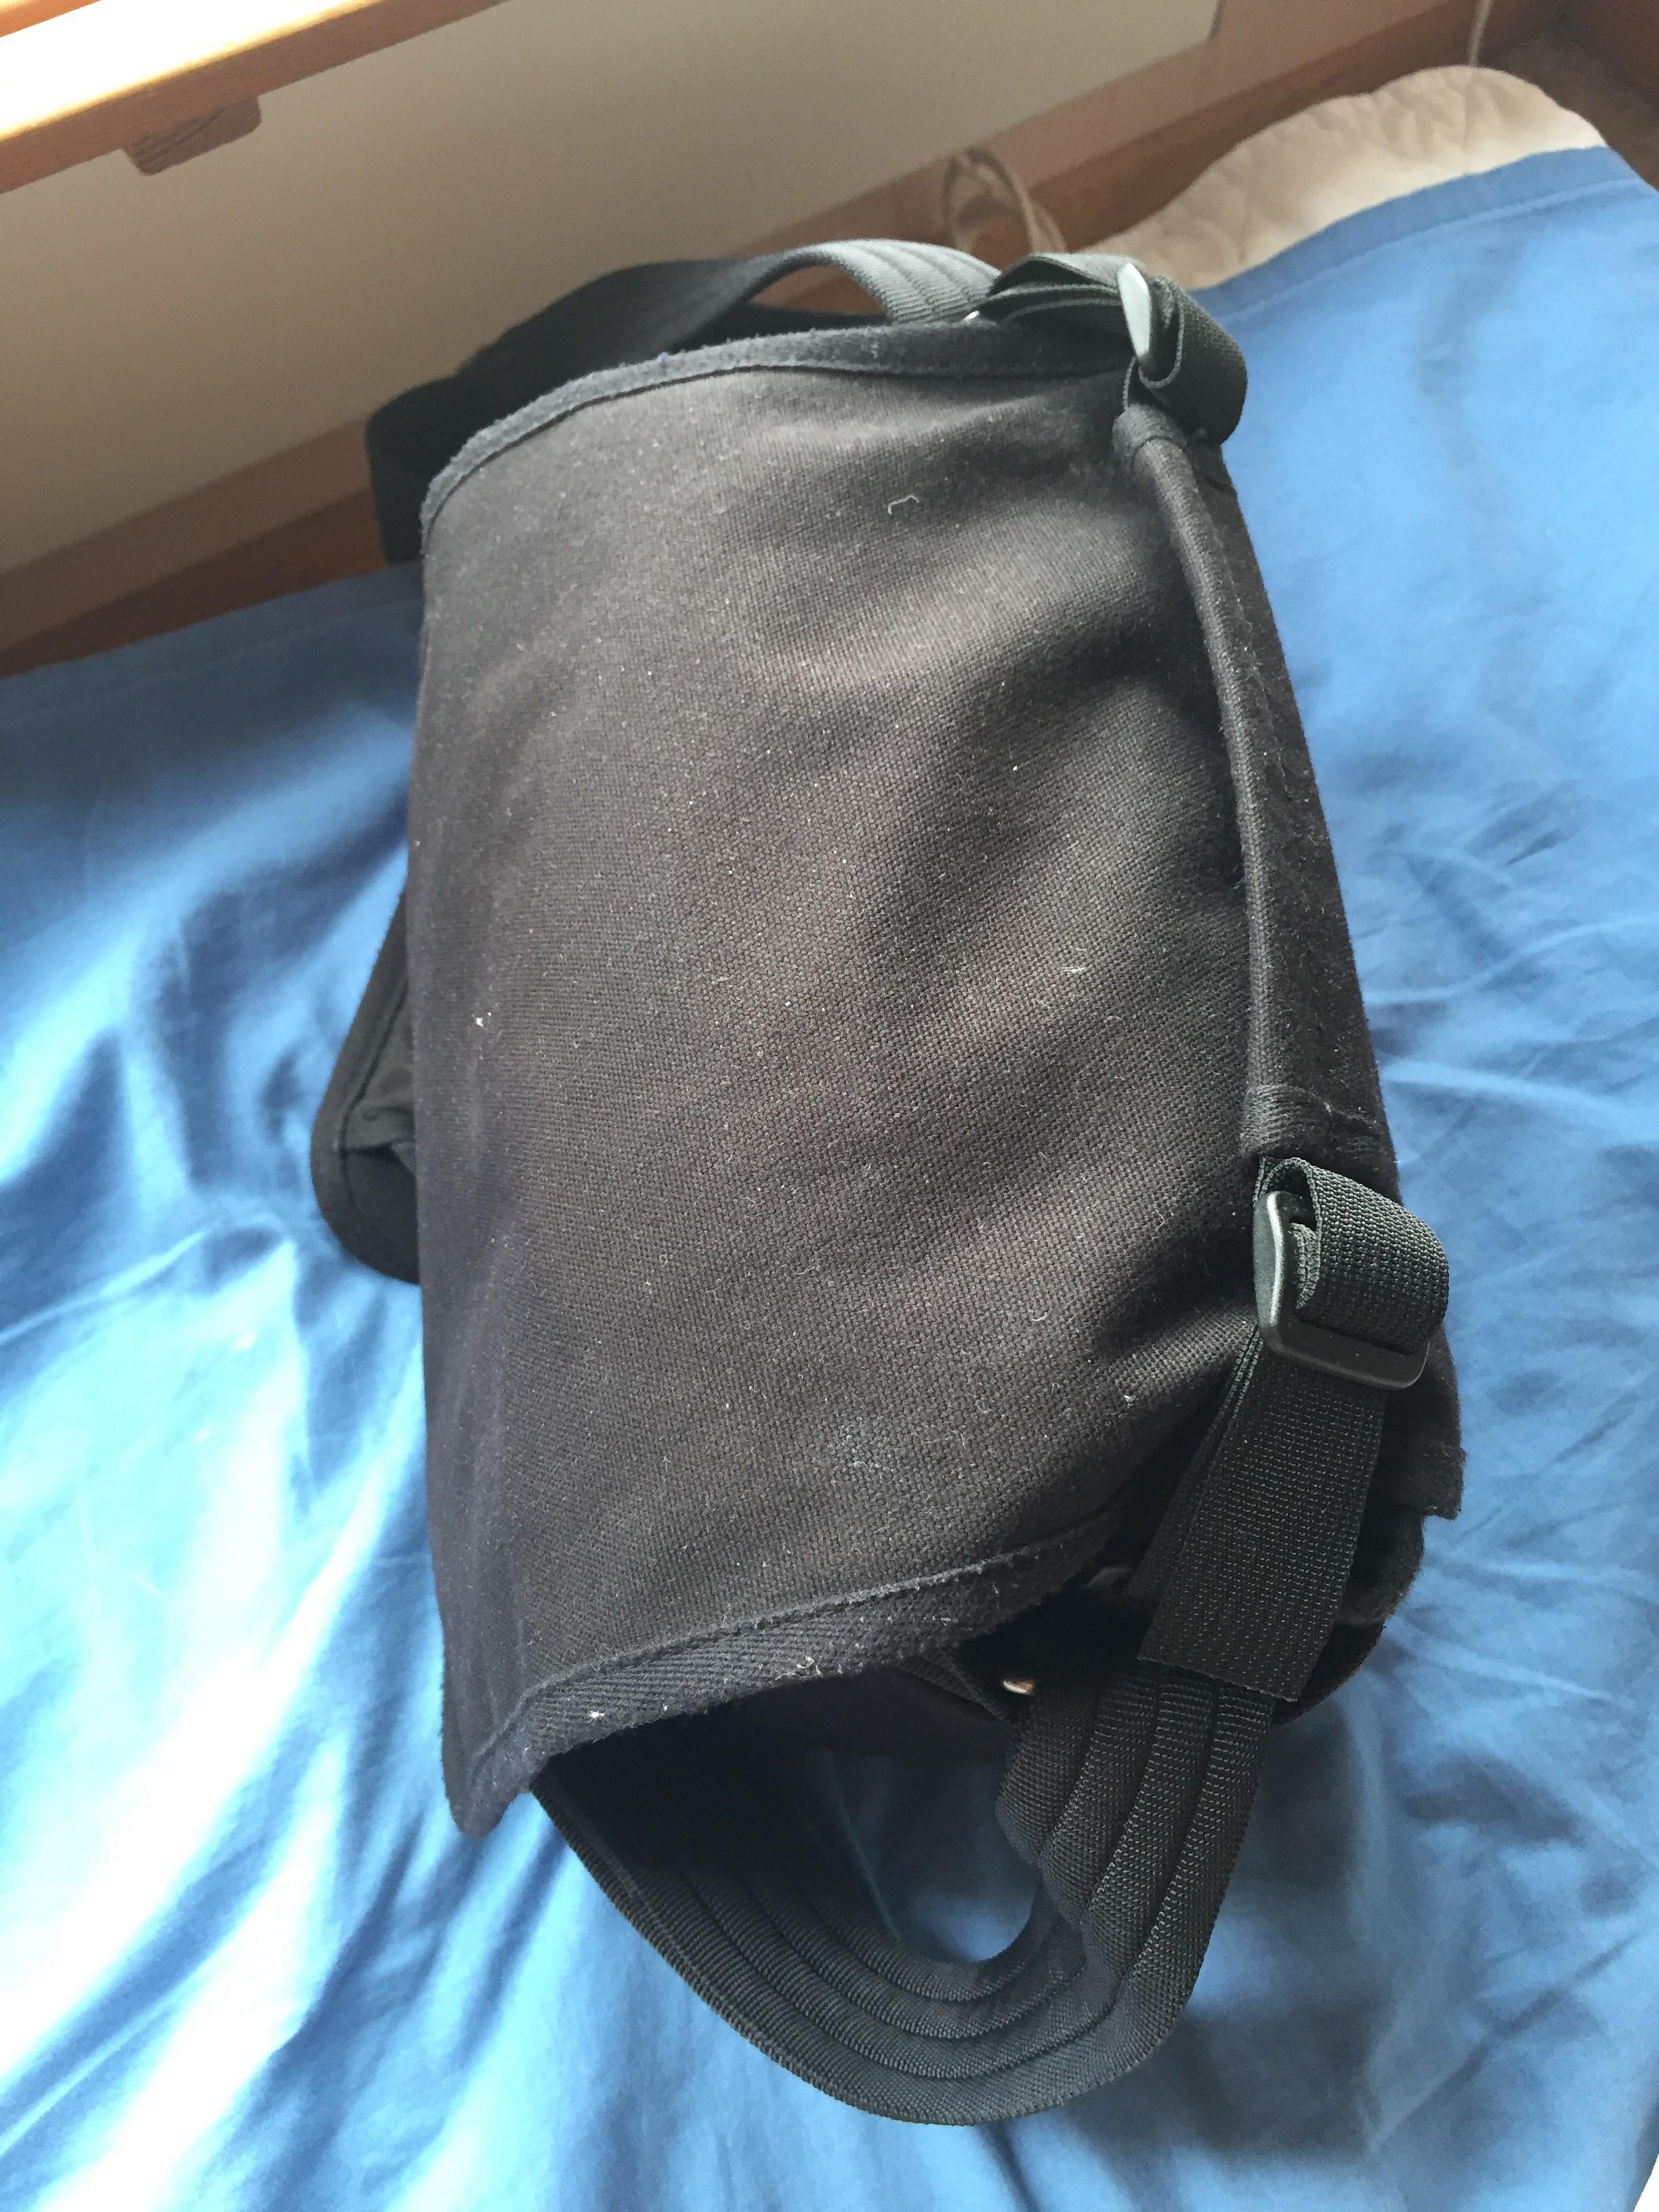 Case Bag For A7ii Kit Prime Telephoto Lens Sony Alpha Full Lowepro Adventura Sh 120 Ii Black View Original Size